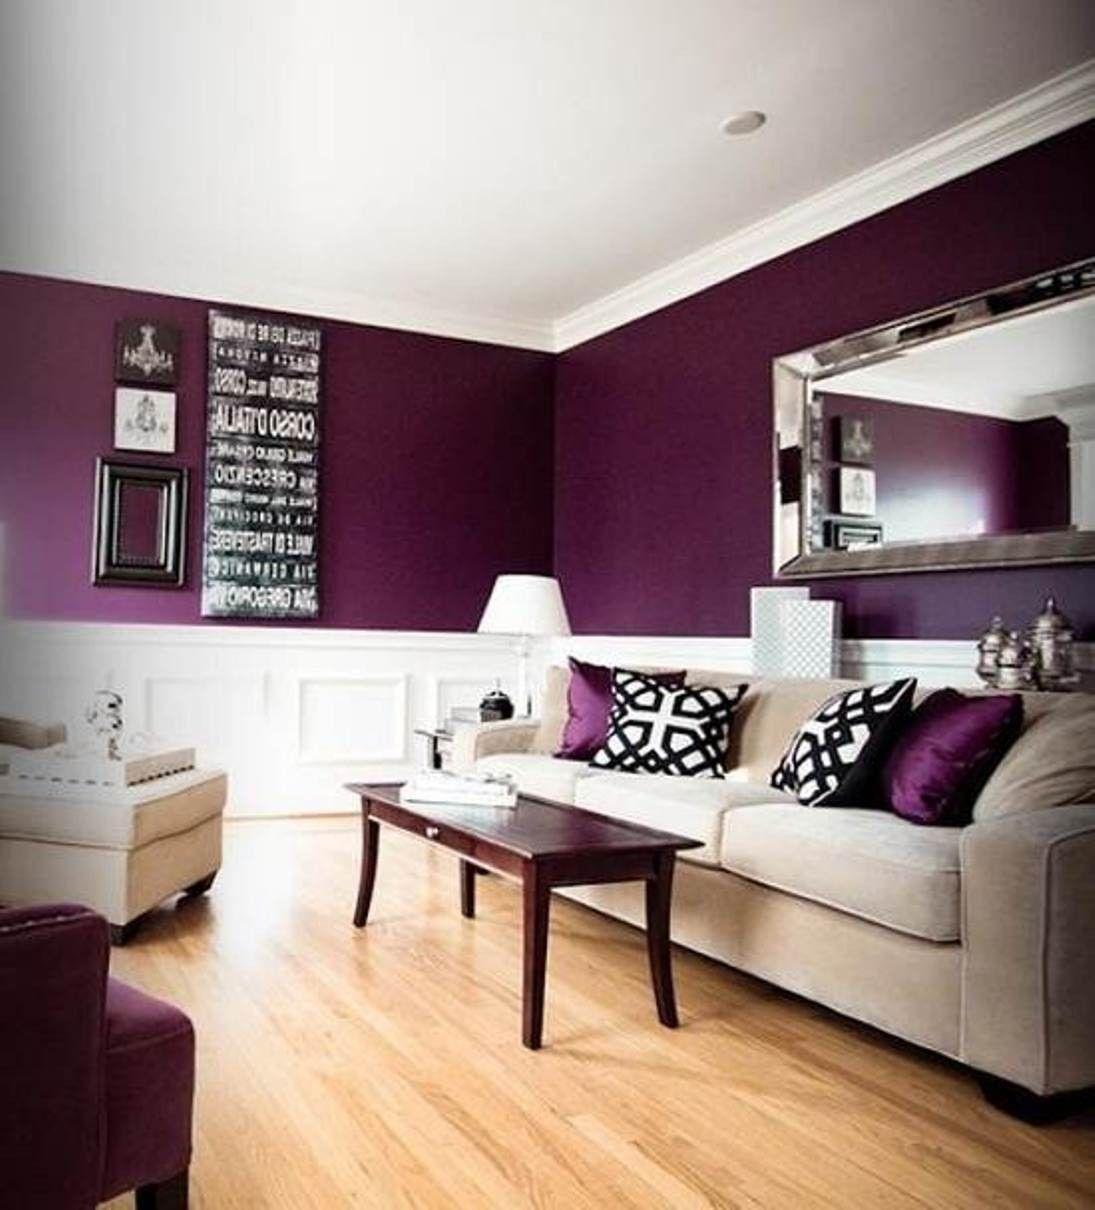 mixed living room interior design color scheme ideas #color